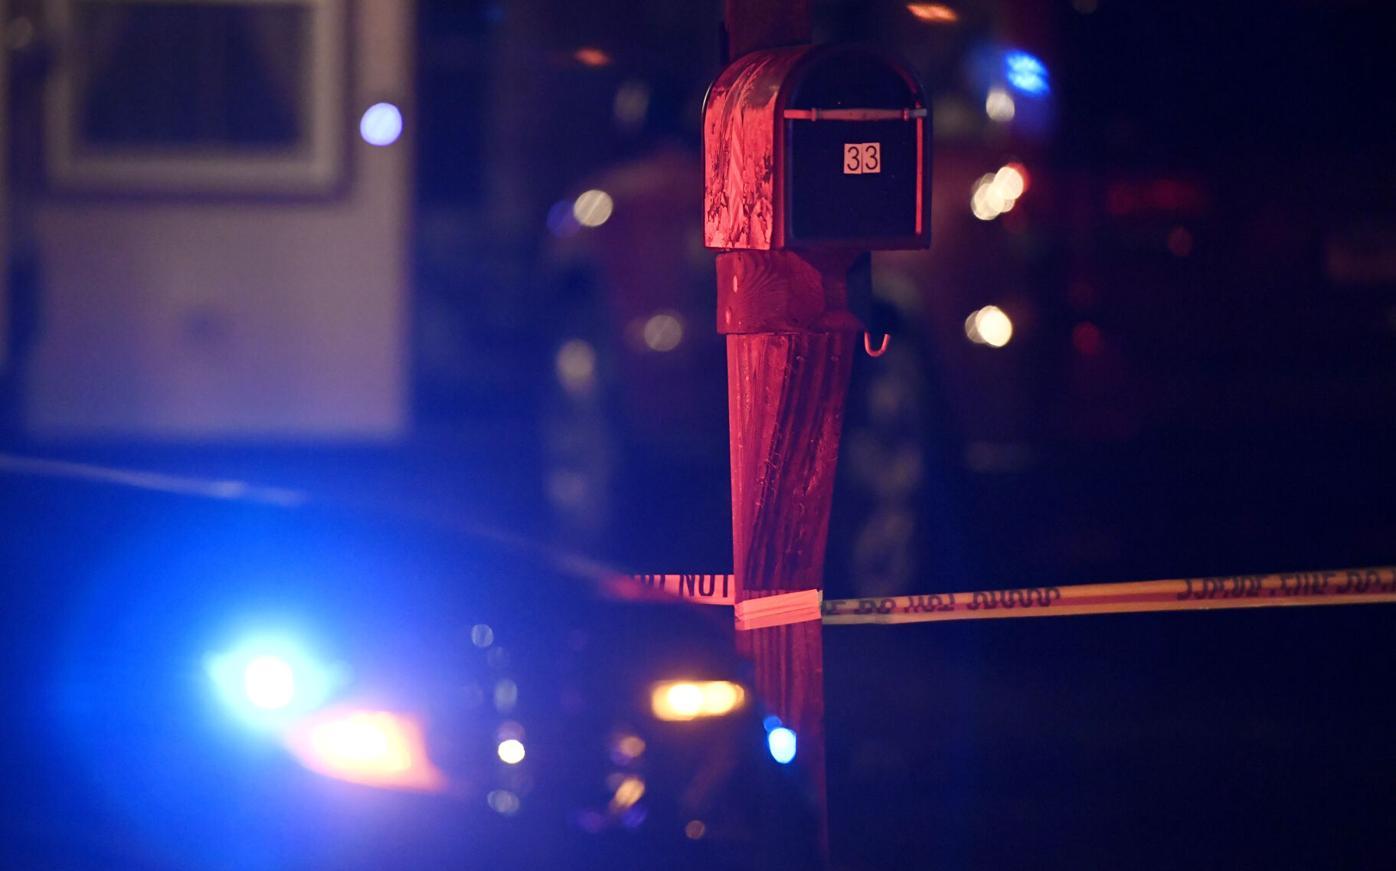 33 Dale St Windsor Locks Christmas night Police Investigation 008  .jpg